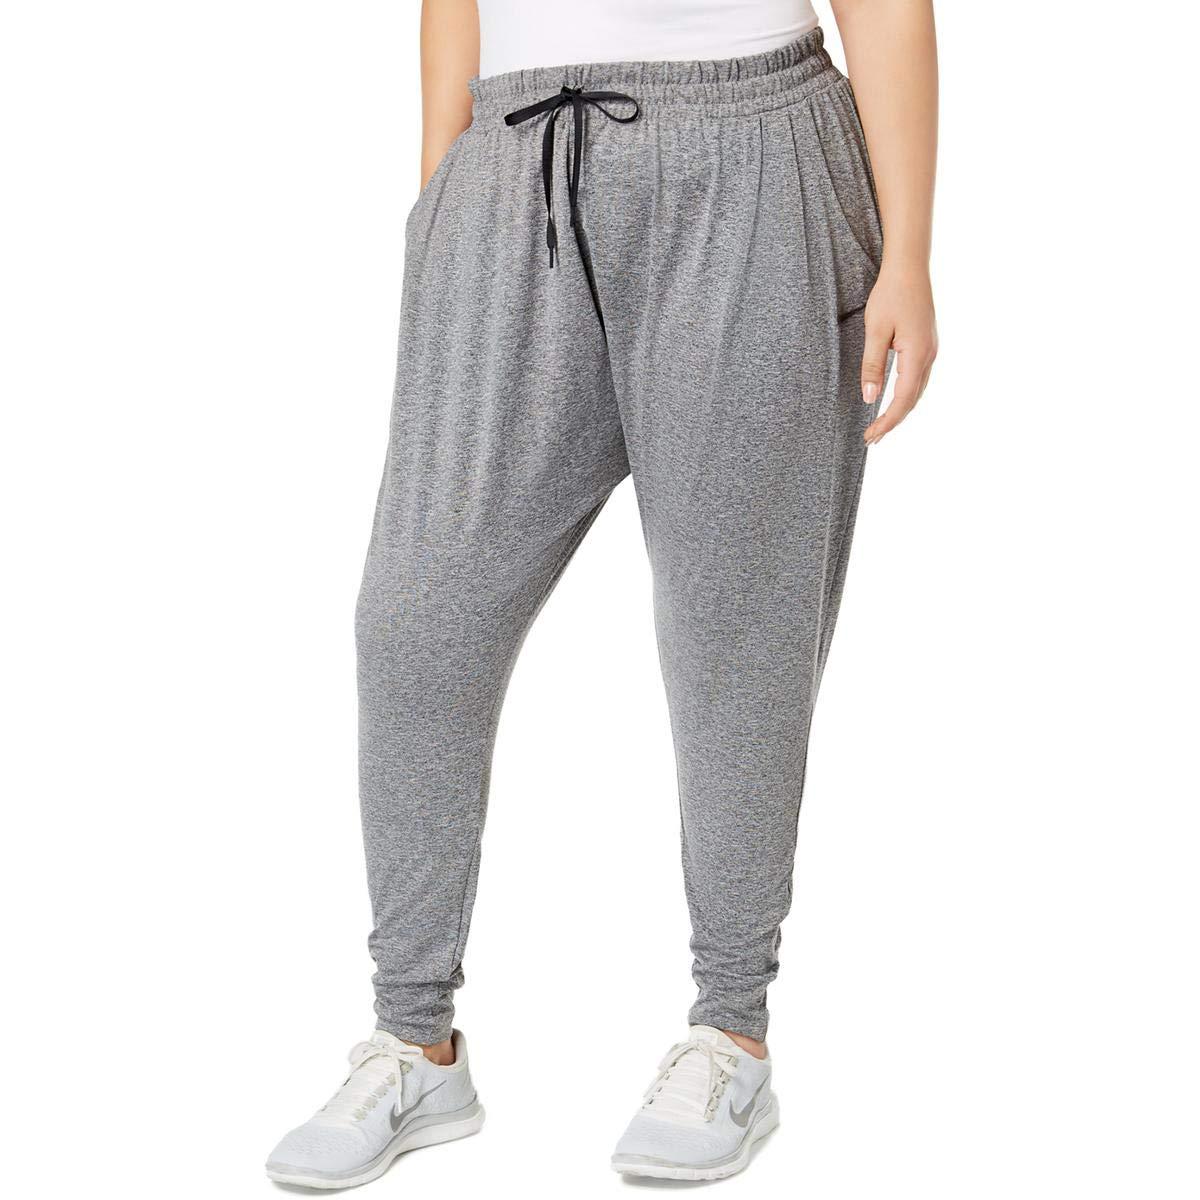 esfera sonriendo Organo  Nike Womens Plus Yoga Dance Pants Gray 2X: Amazon.in: Clothing & Accessories